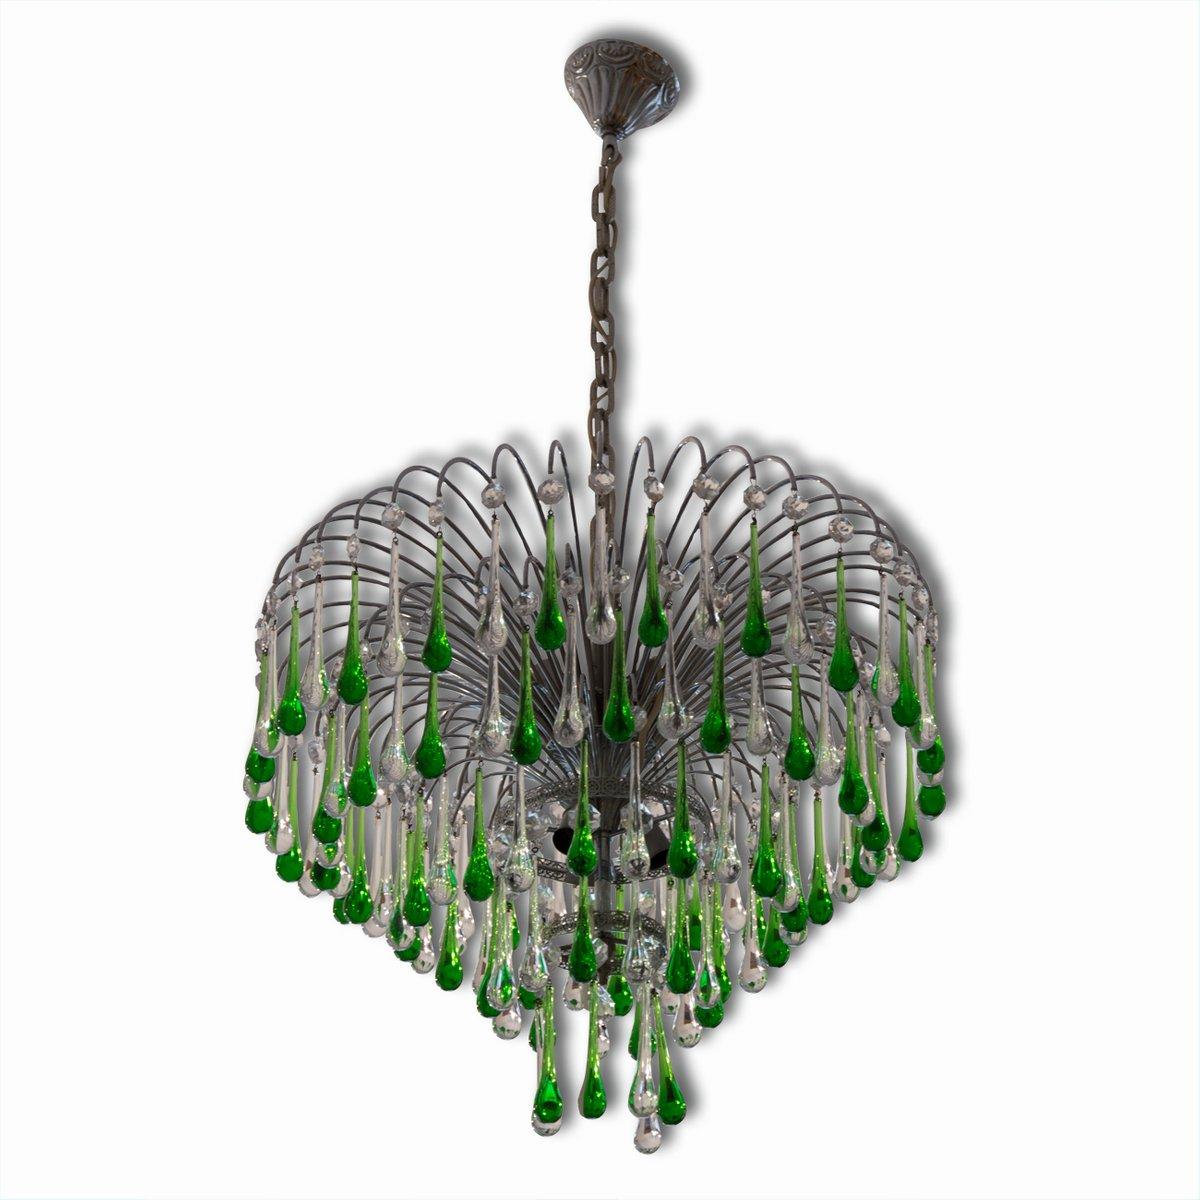 Italian murano crystal teardrop waterfall chandelier 1950s for sale italian murano crystal teardrop waterfall chandelier 1950s aloadofball Images